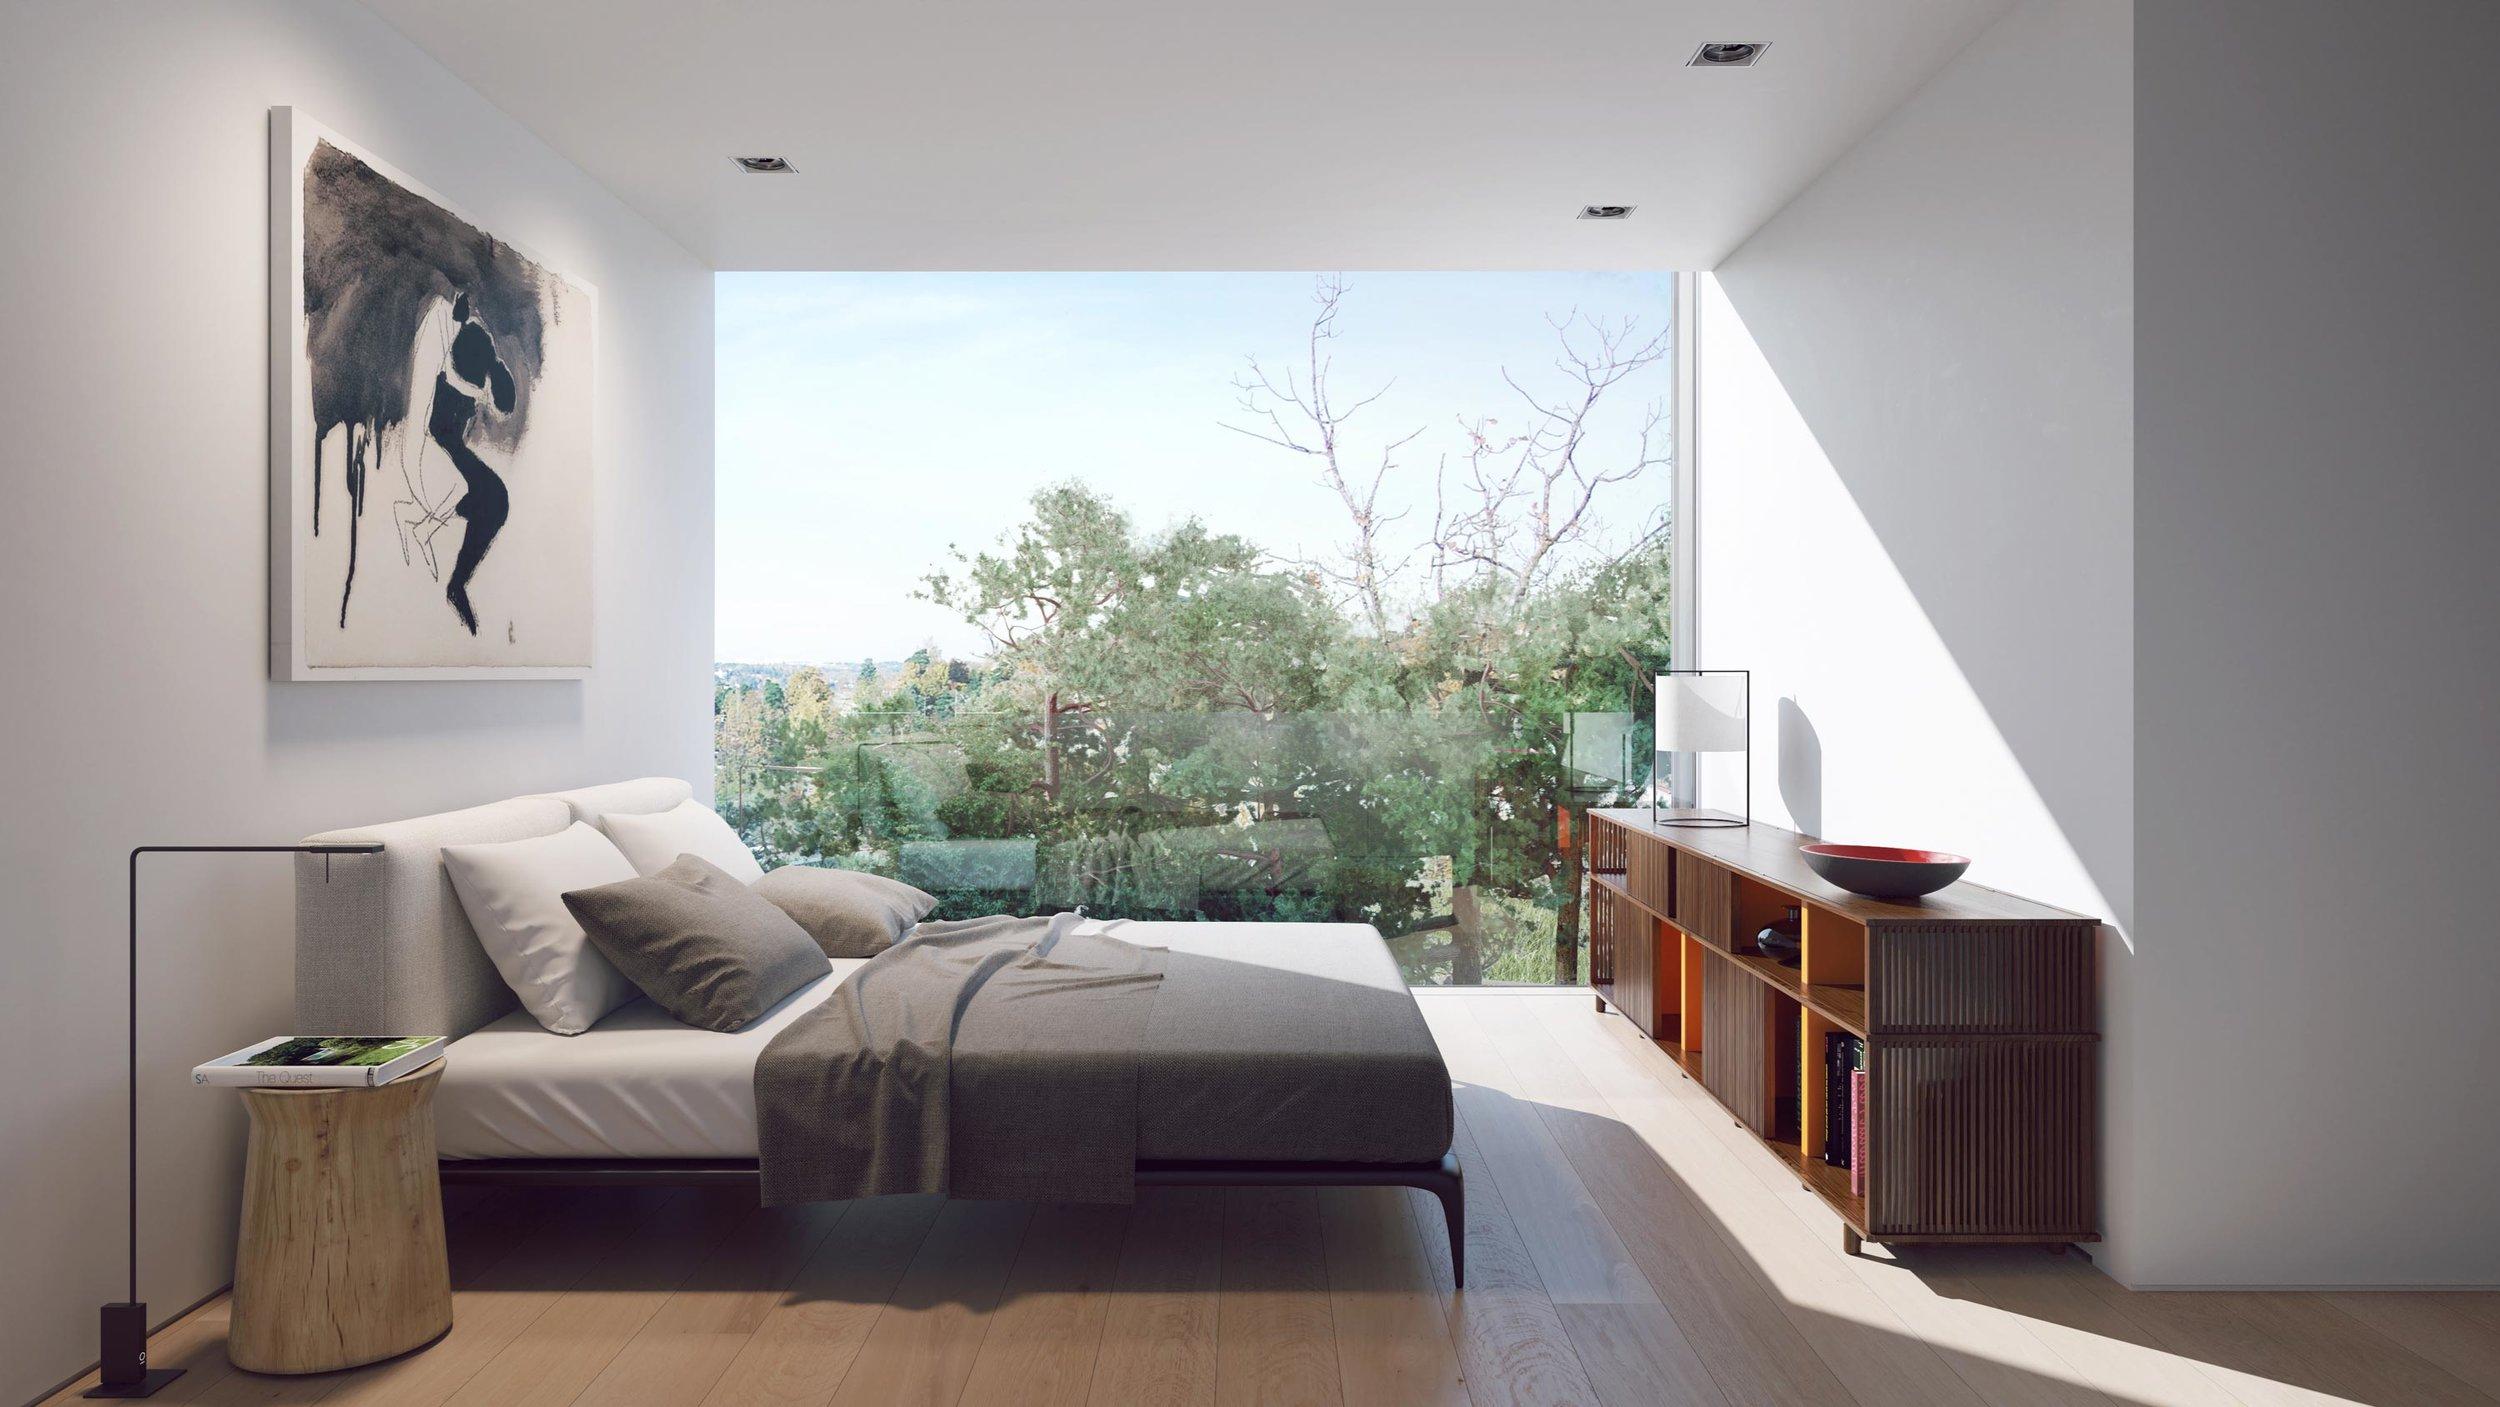 pyrus luxury villas, strom architects, imola, 12.jpg